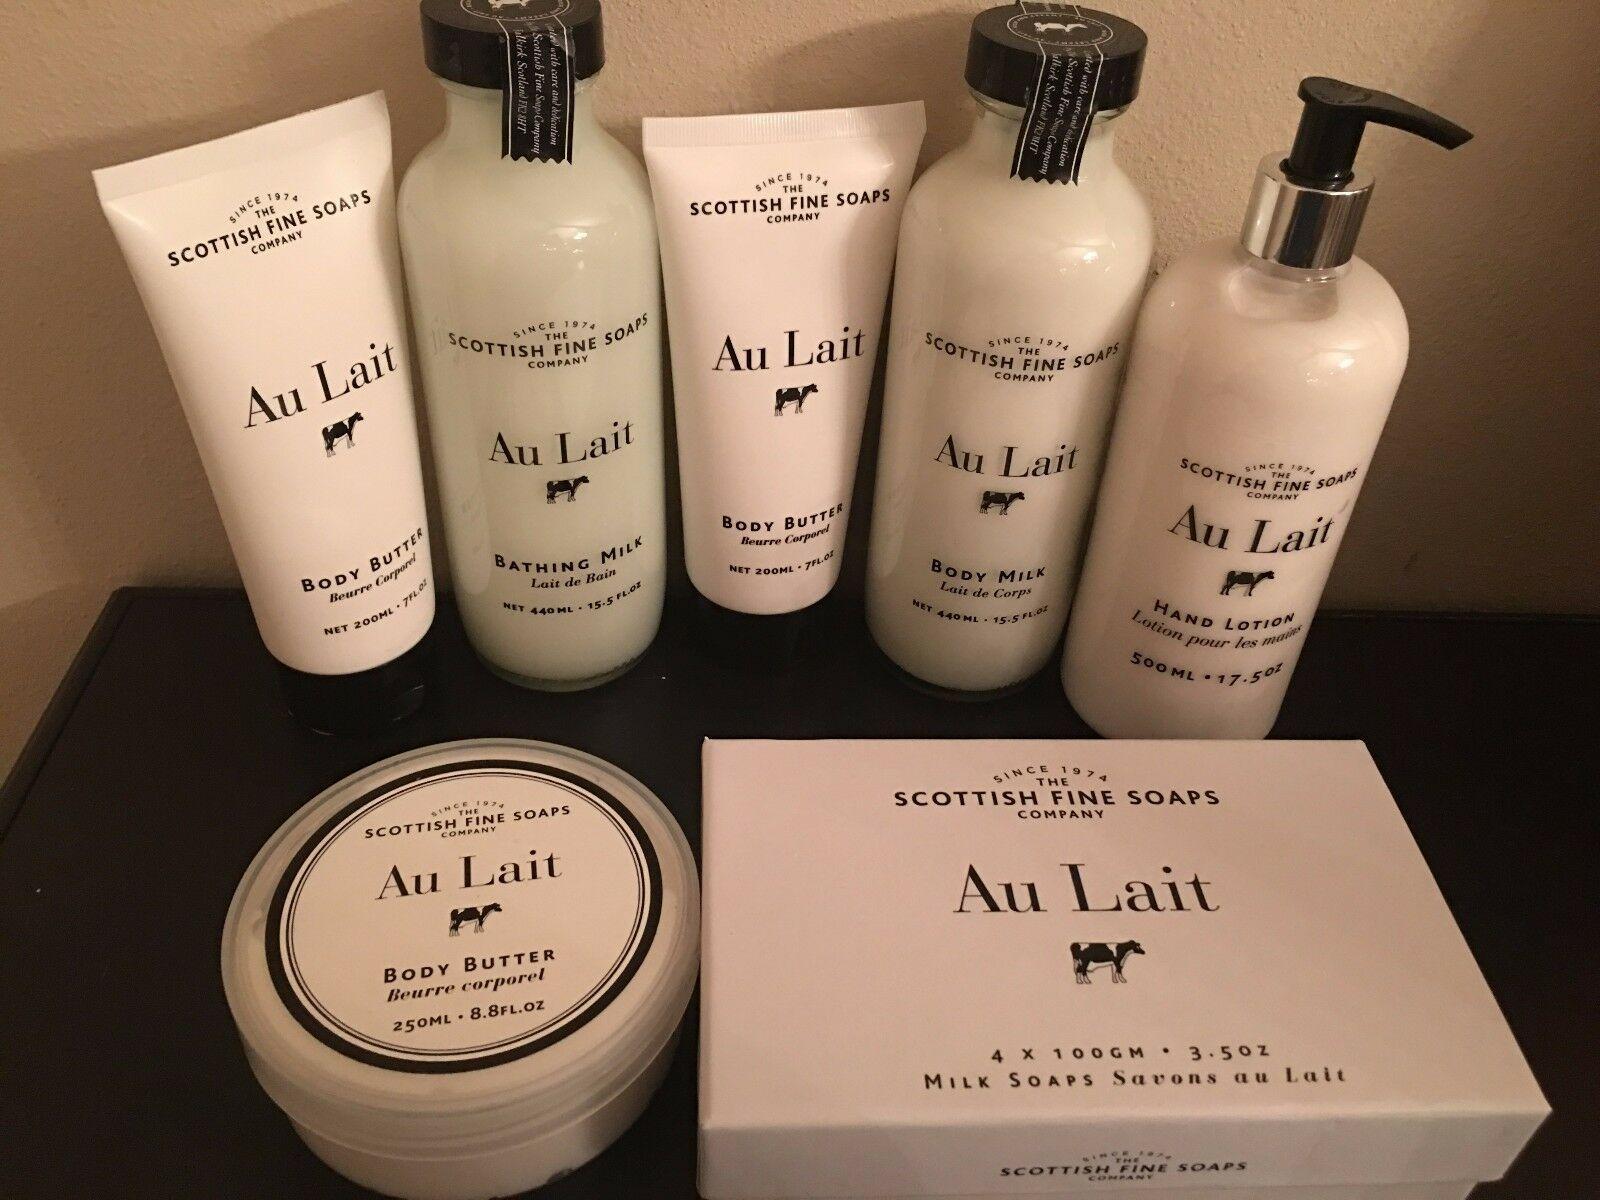 Scottish Fine Soaps Au Lait body lotion/butter/Bathing Milk/hand lotion, new image 2